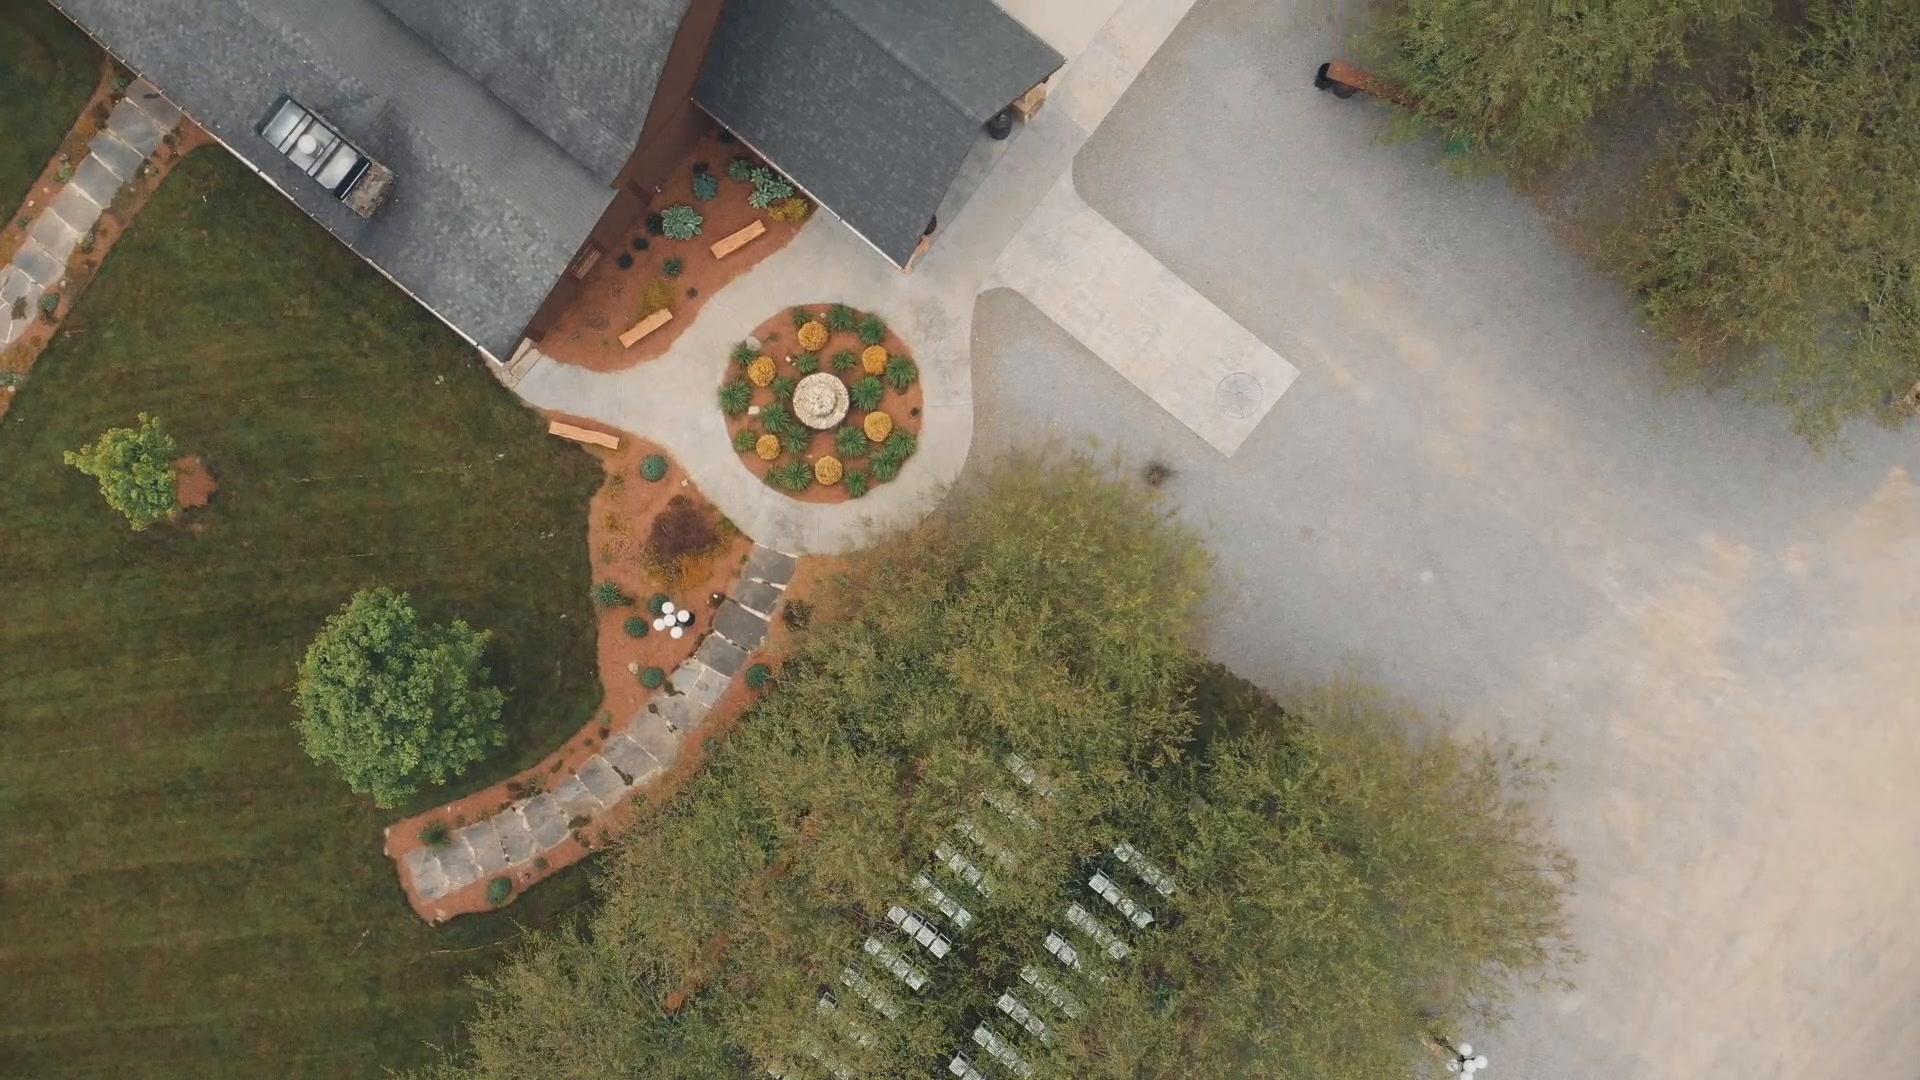 Dilyn + Zach  | Murphy, North Carolina | McGuire's Millrace Farm